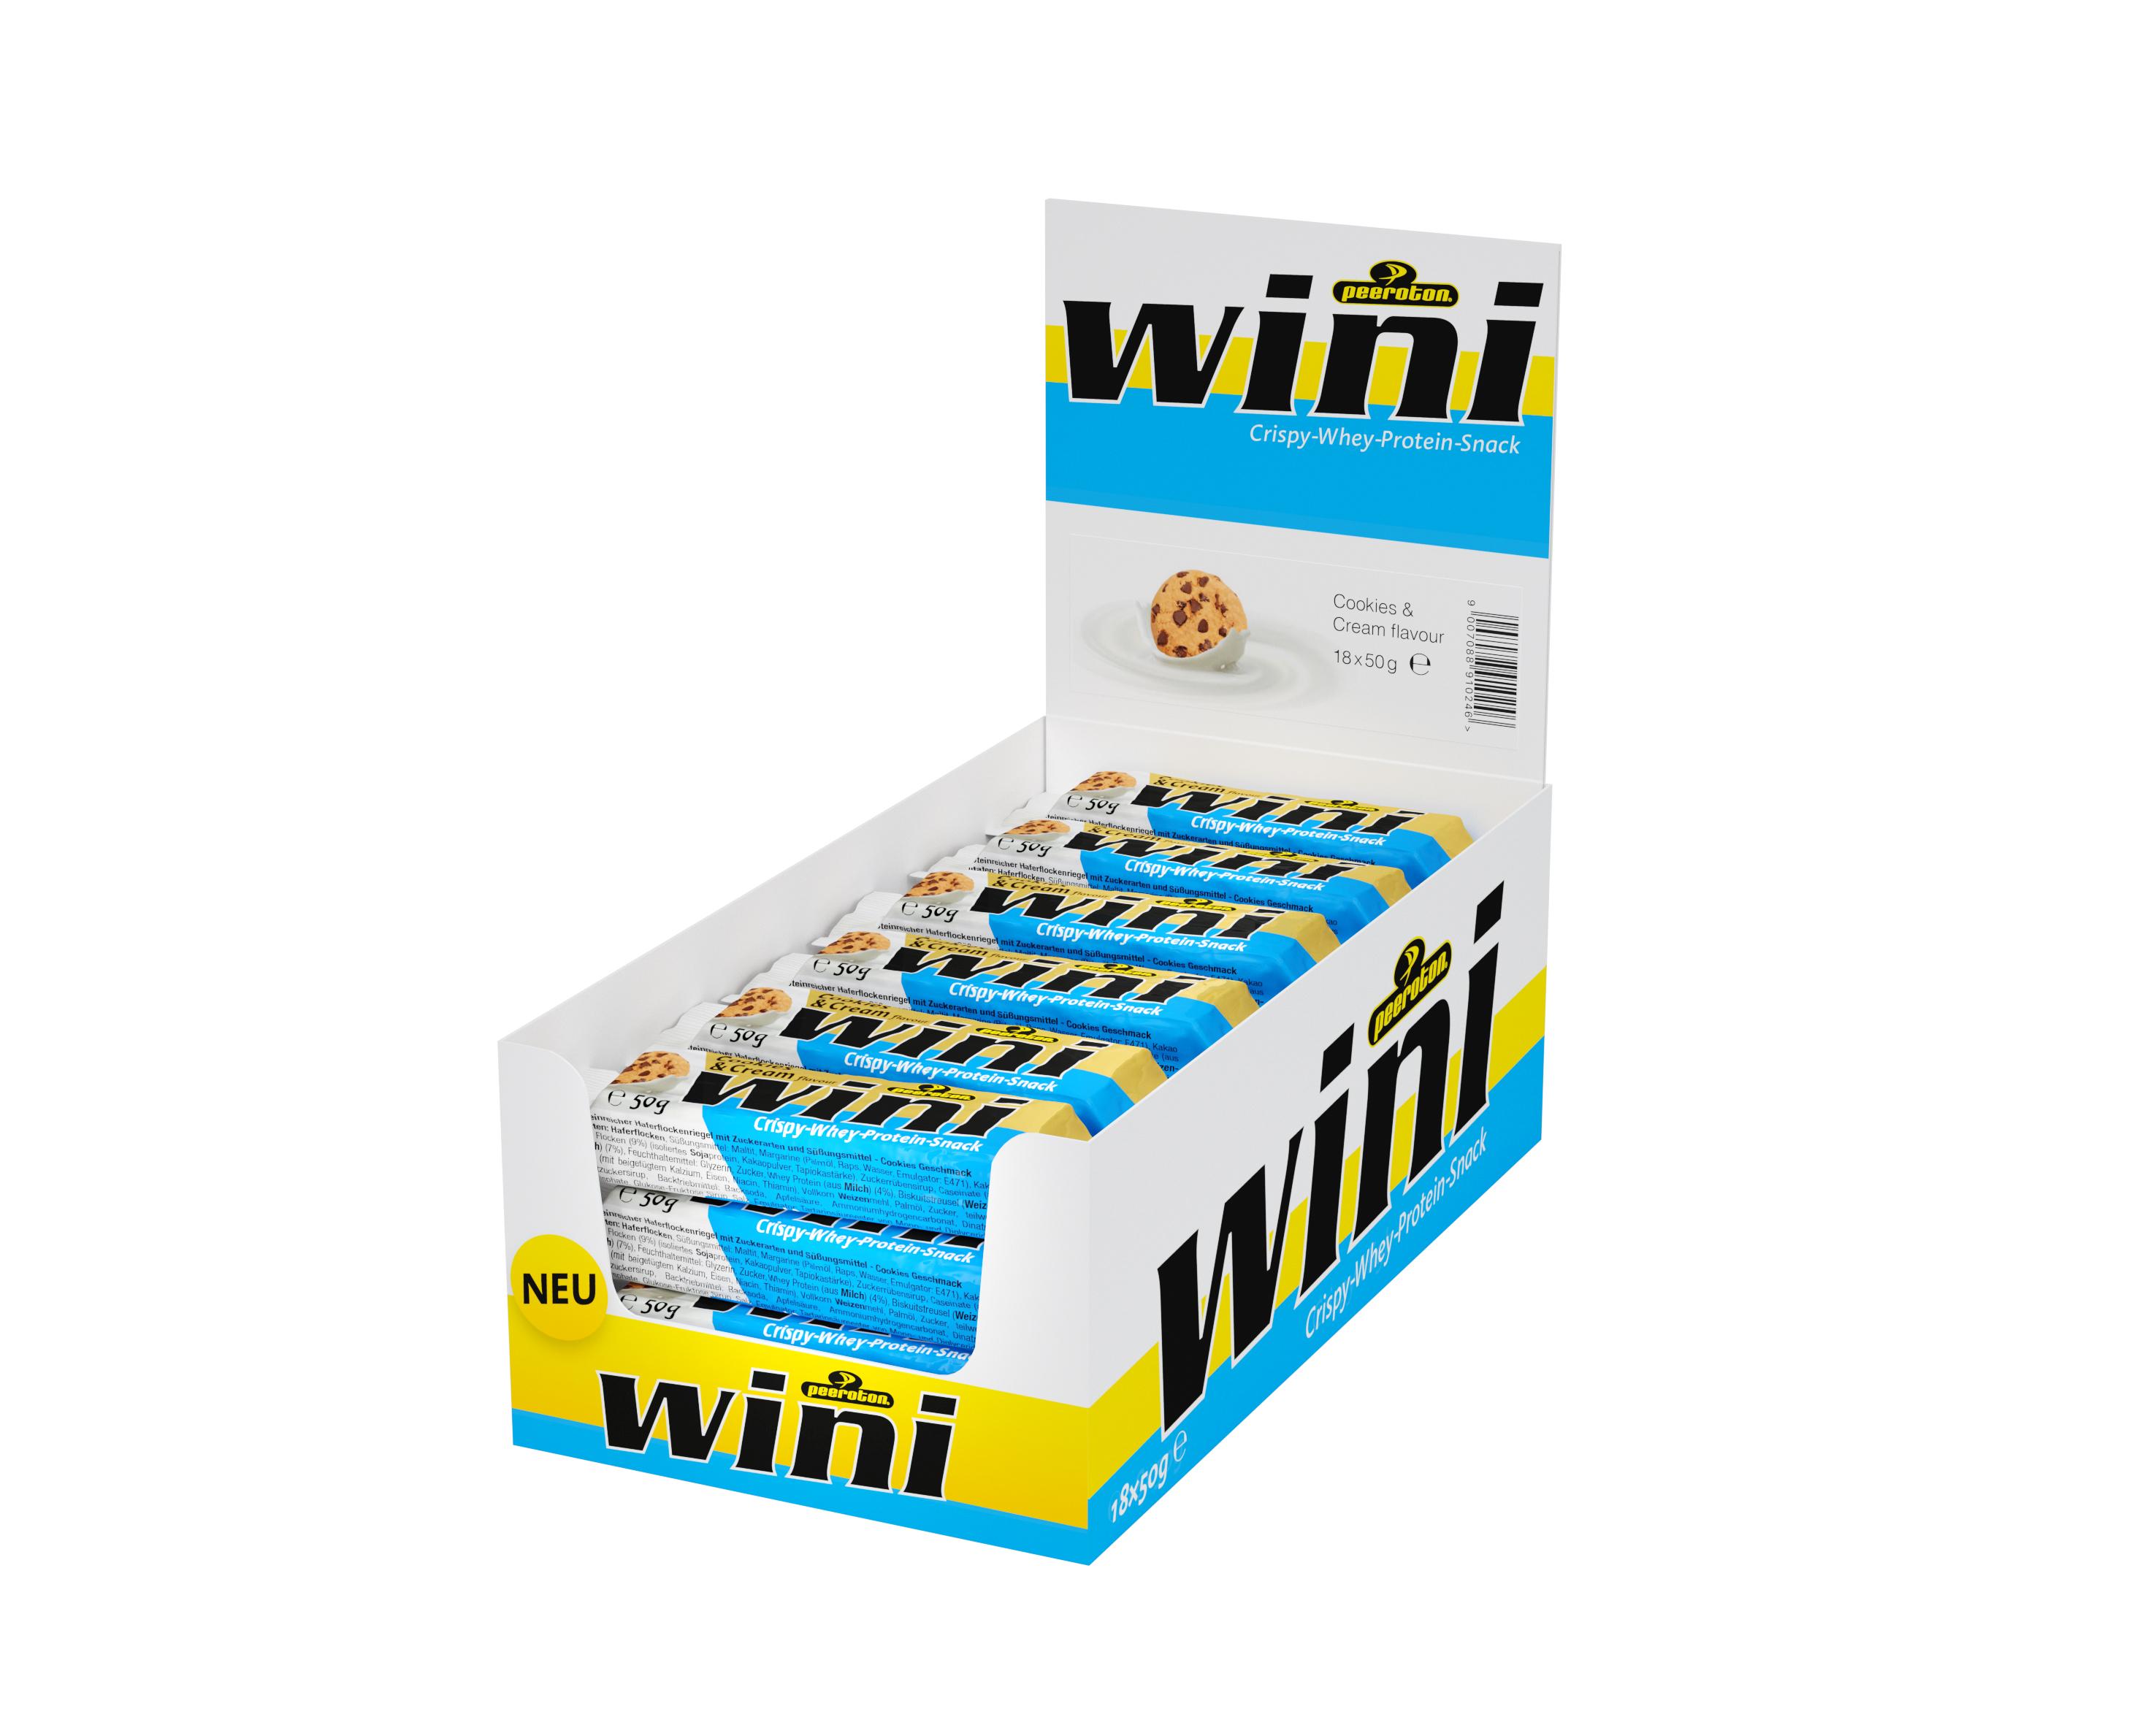 Peeroton WINI Crispy-Whey Protein Riegel Cookies & Cream 50g, 15+3 Gratis